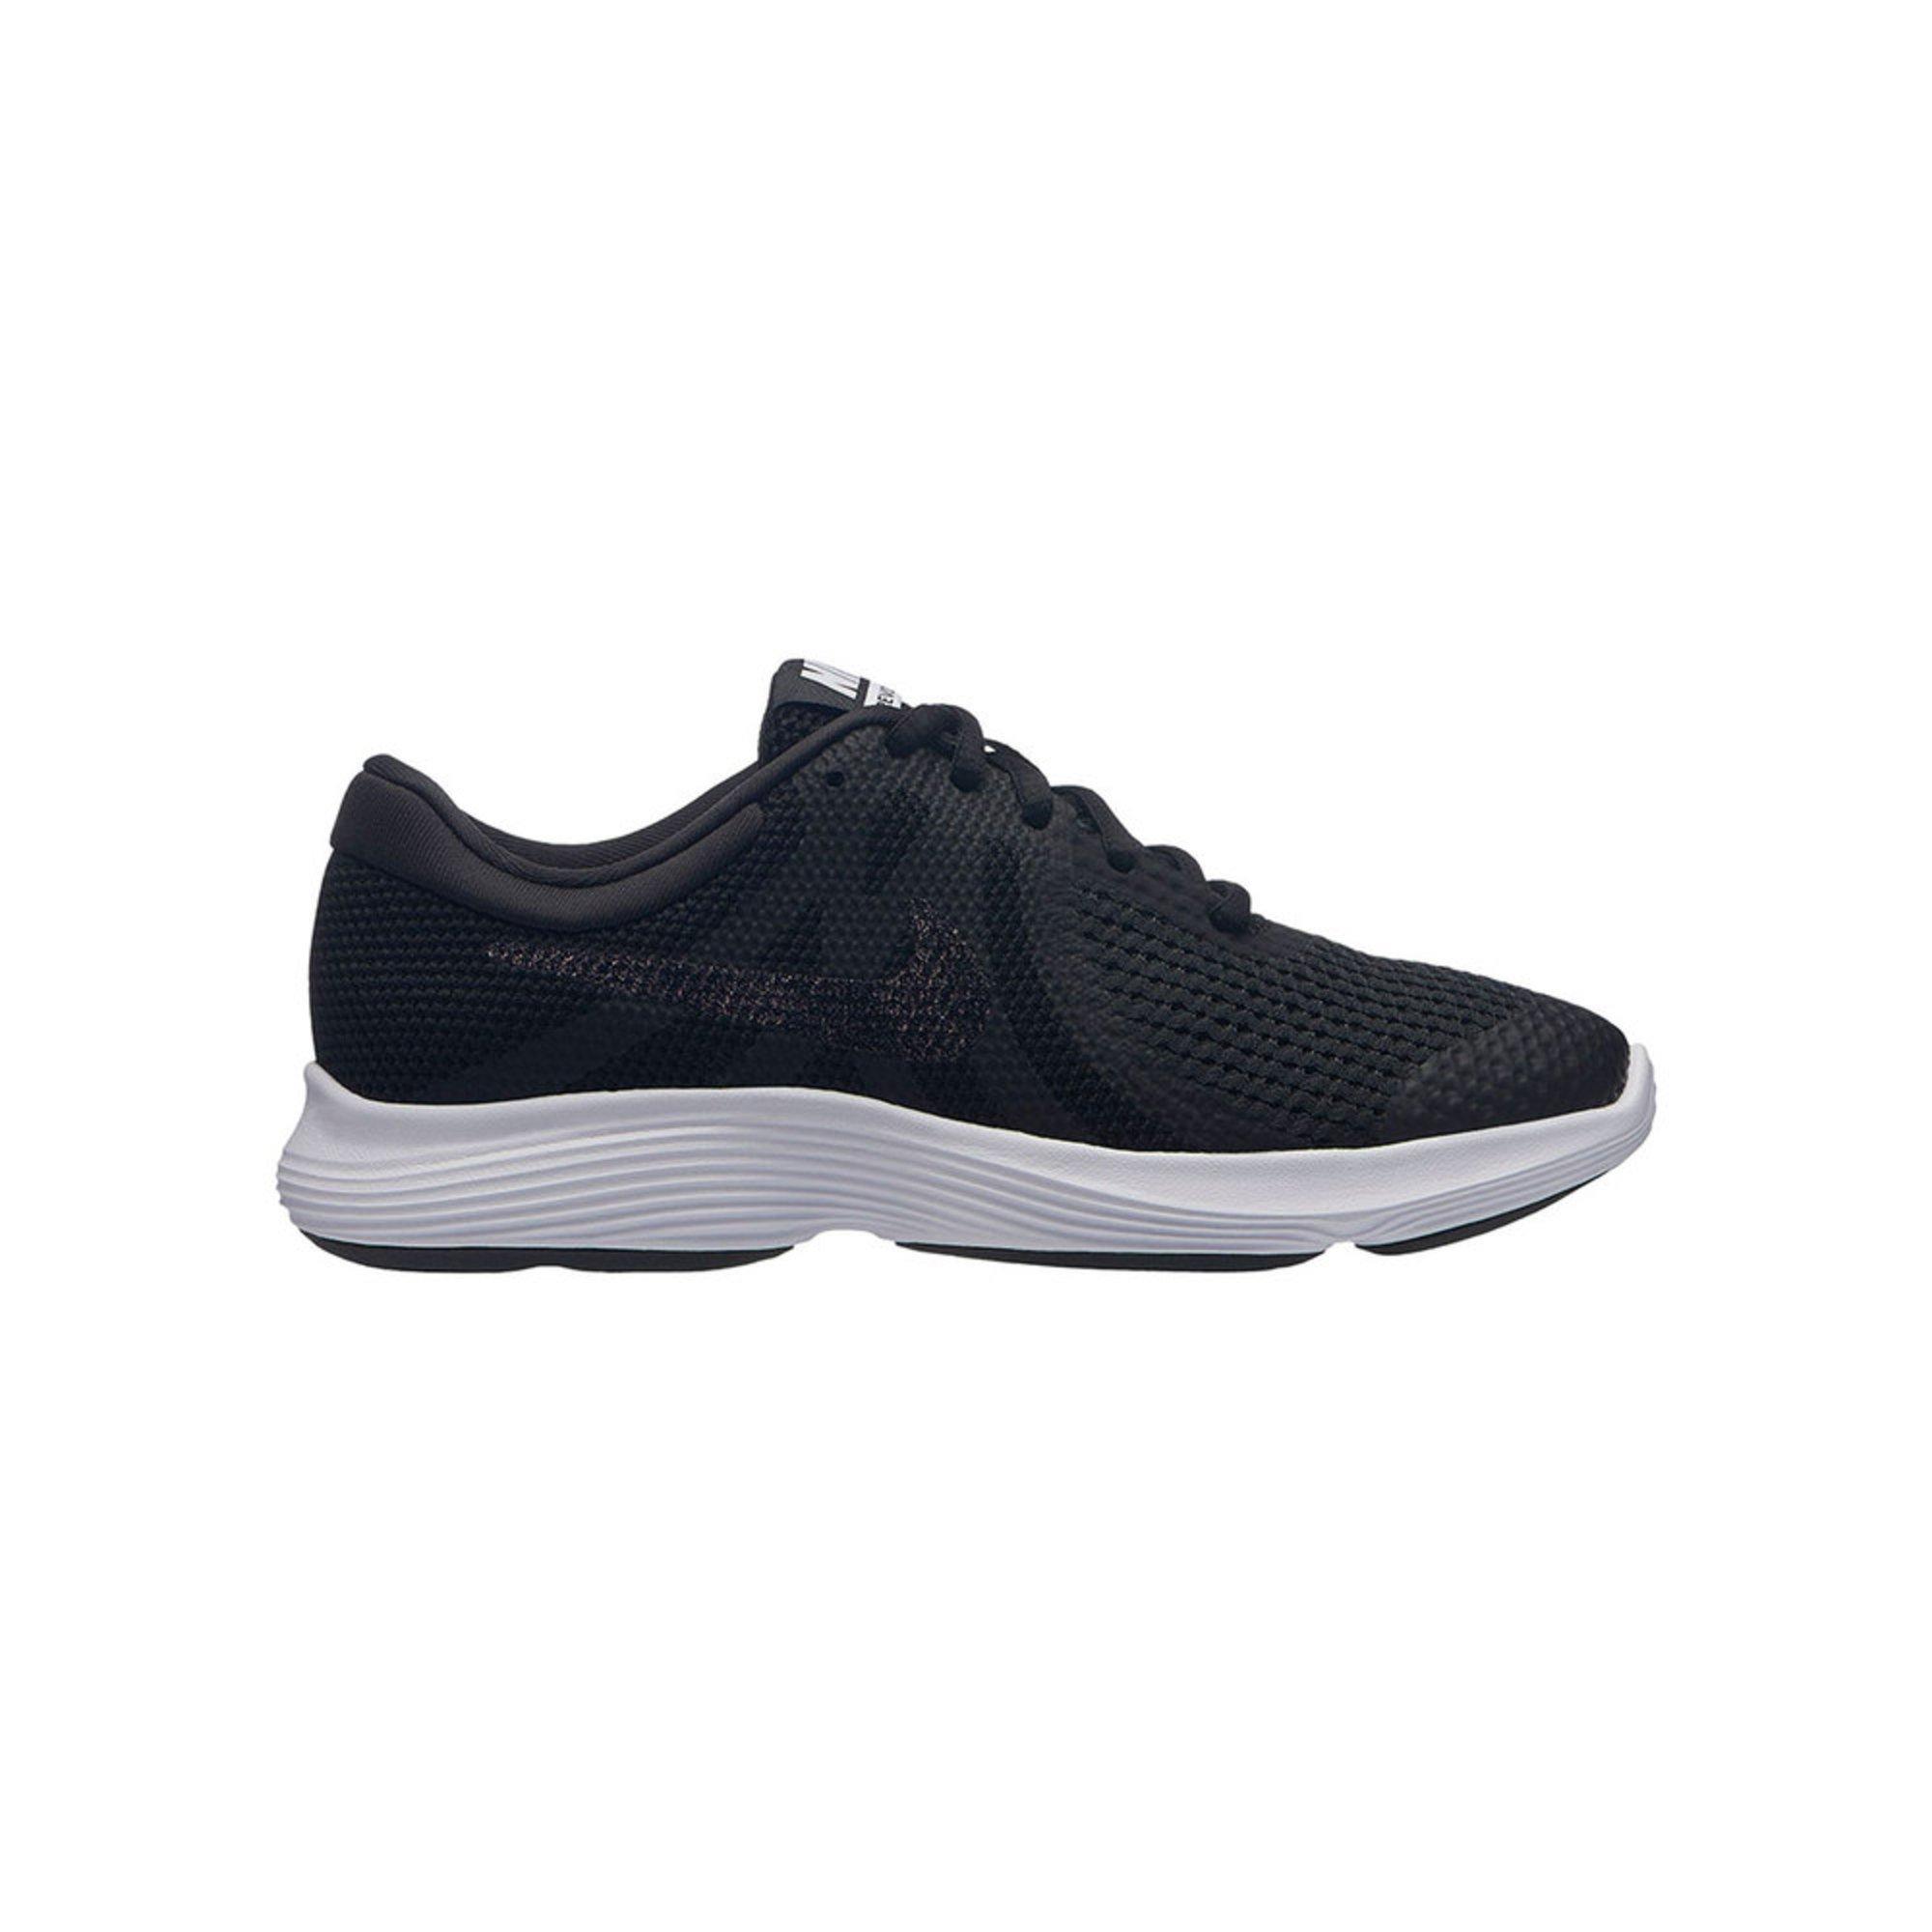 fa947c683b1 Nike. Nike Girls Revolution 4 Shield Running Shoe (Youth)